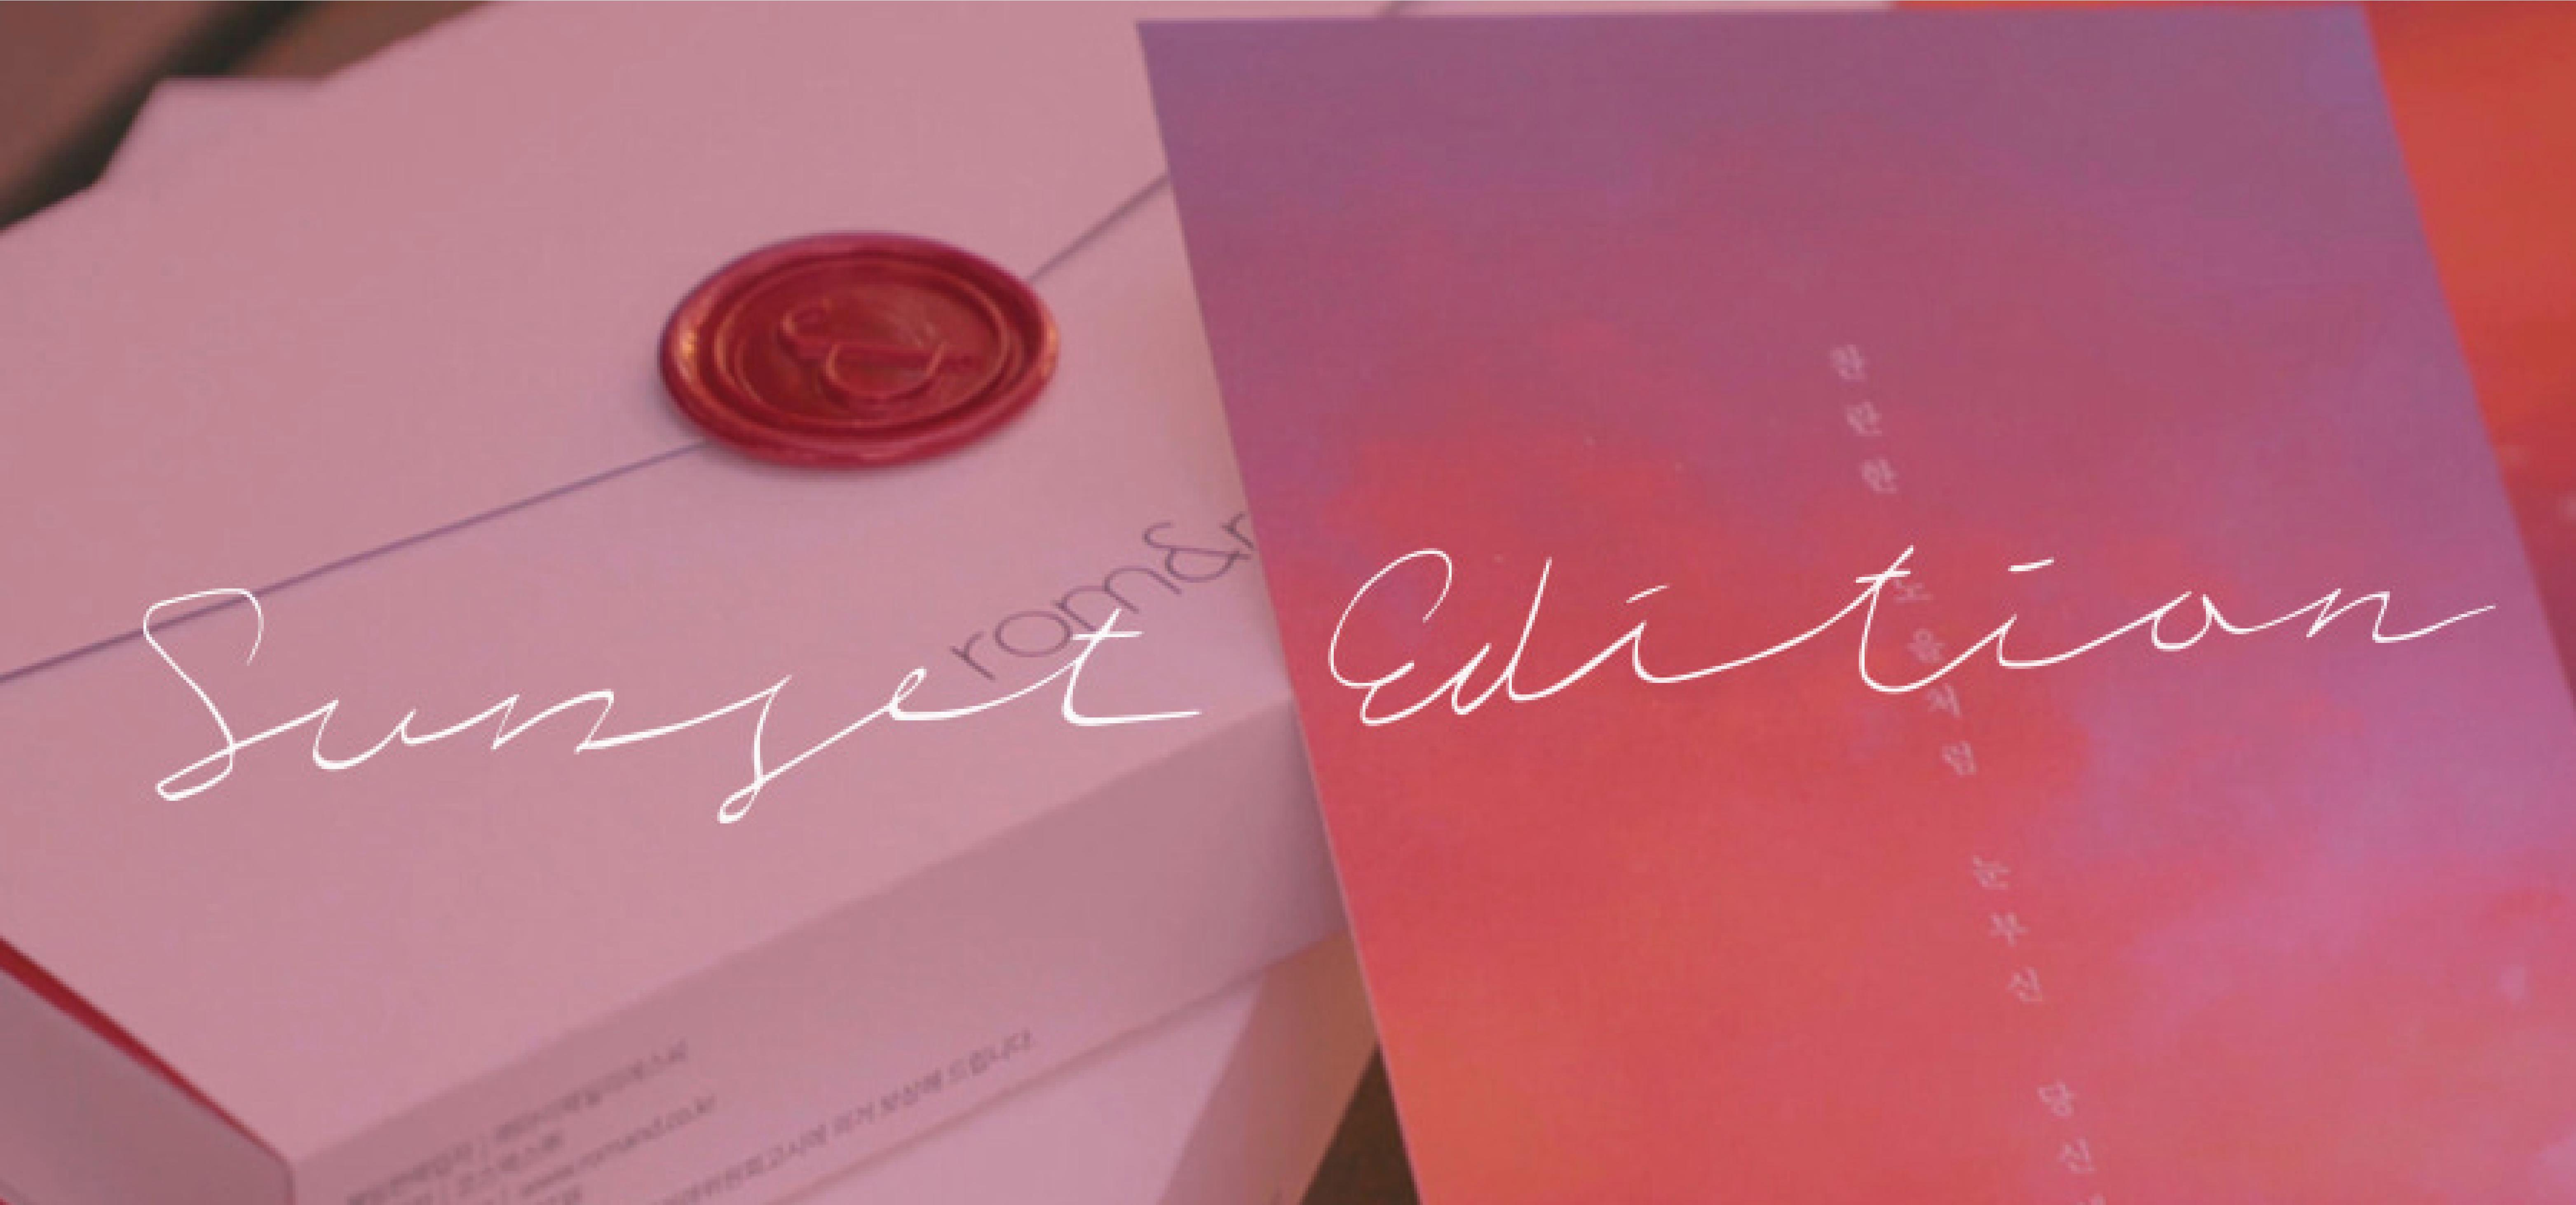 sunset-edition-zerogram-romand